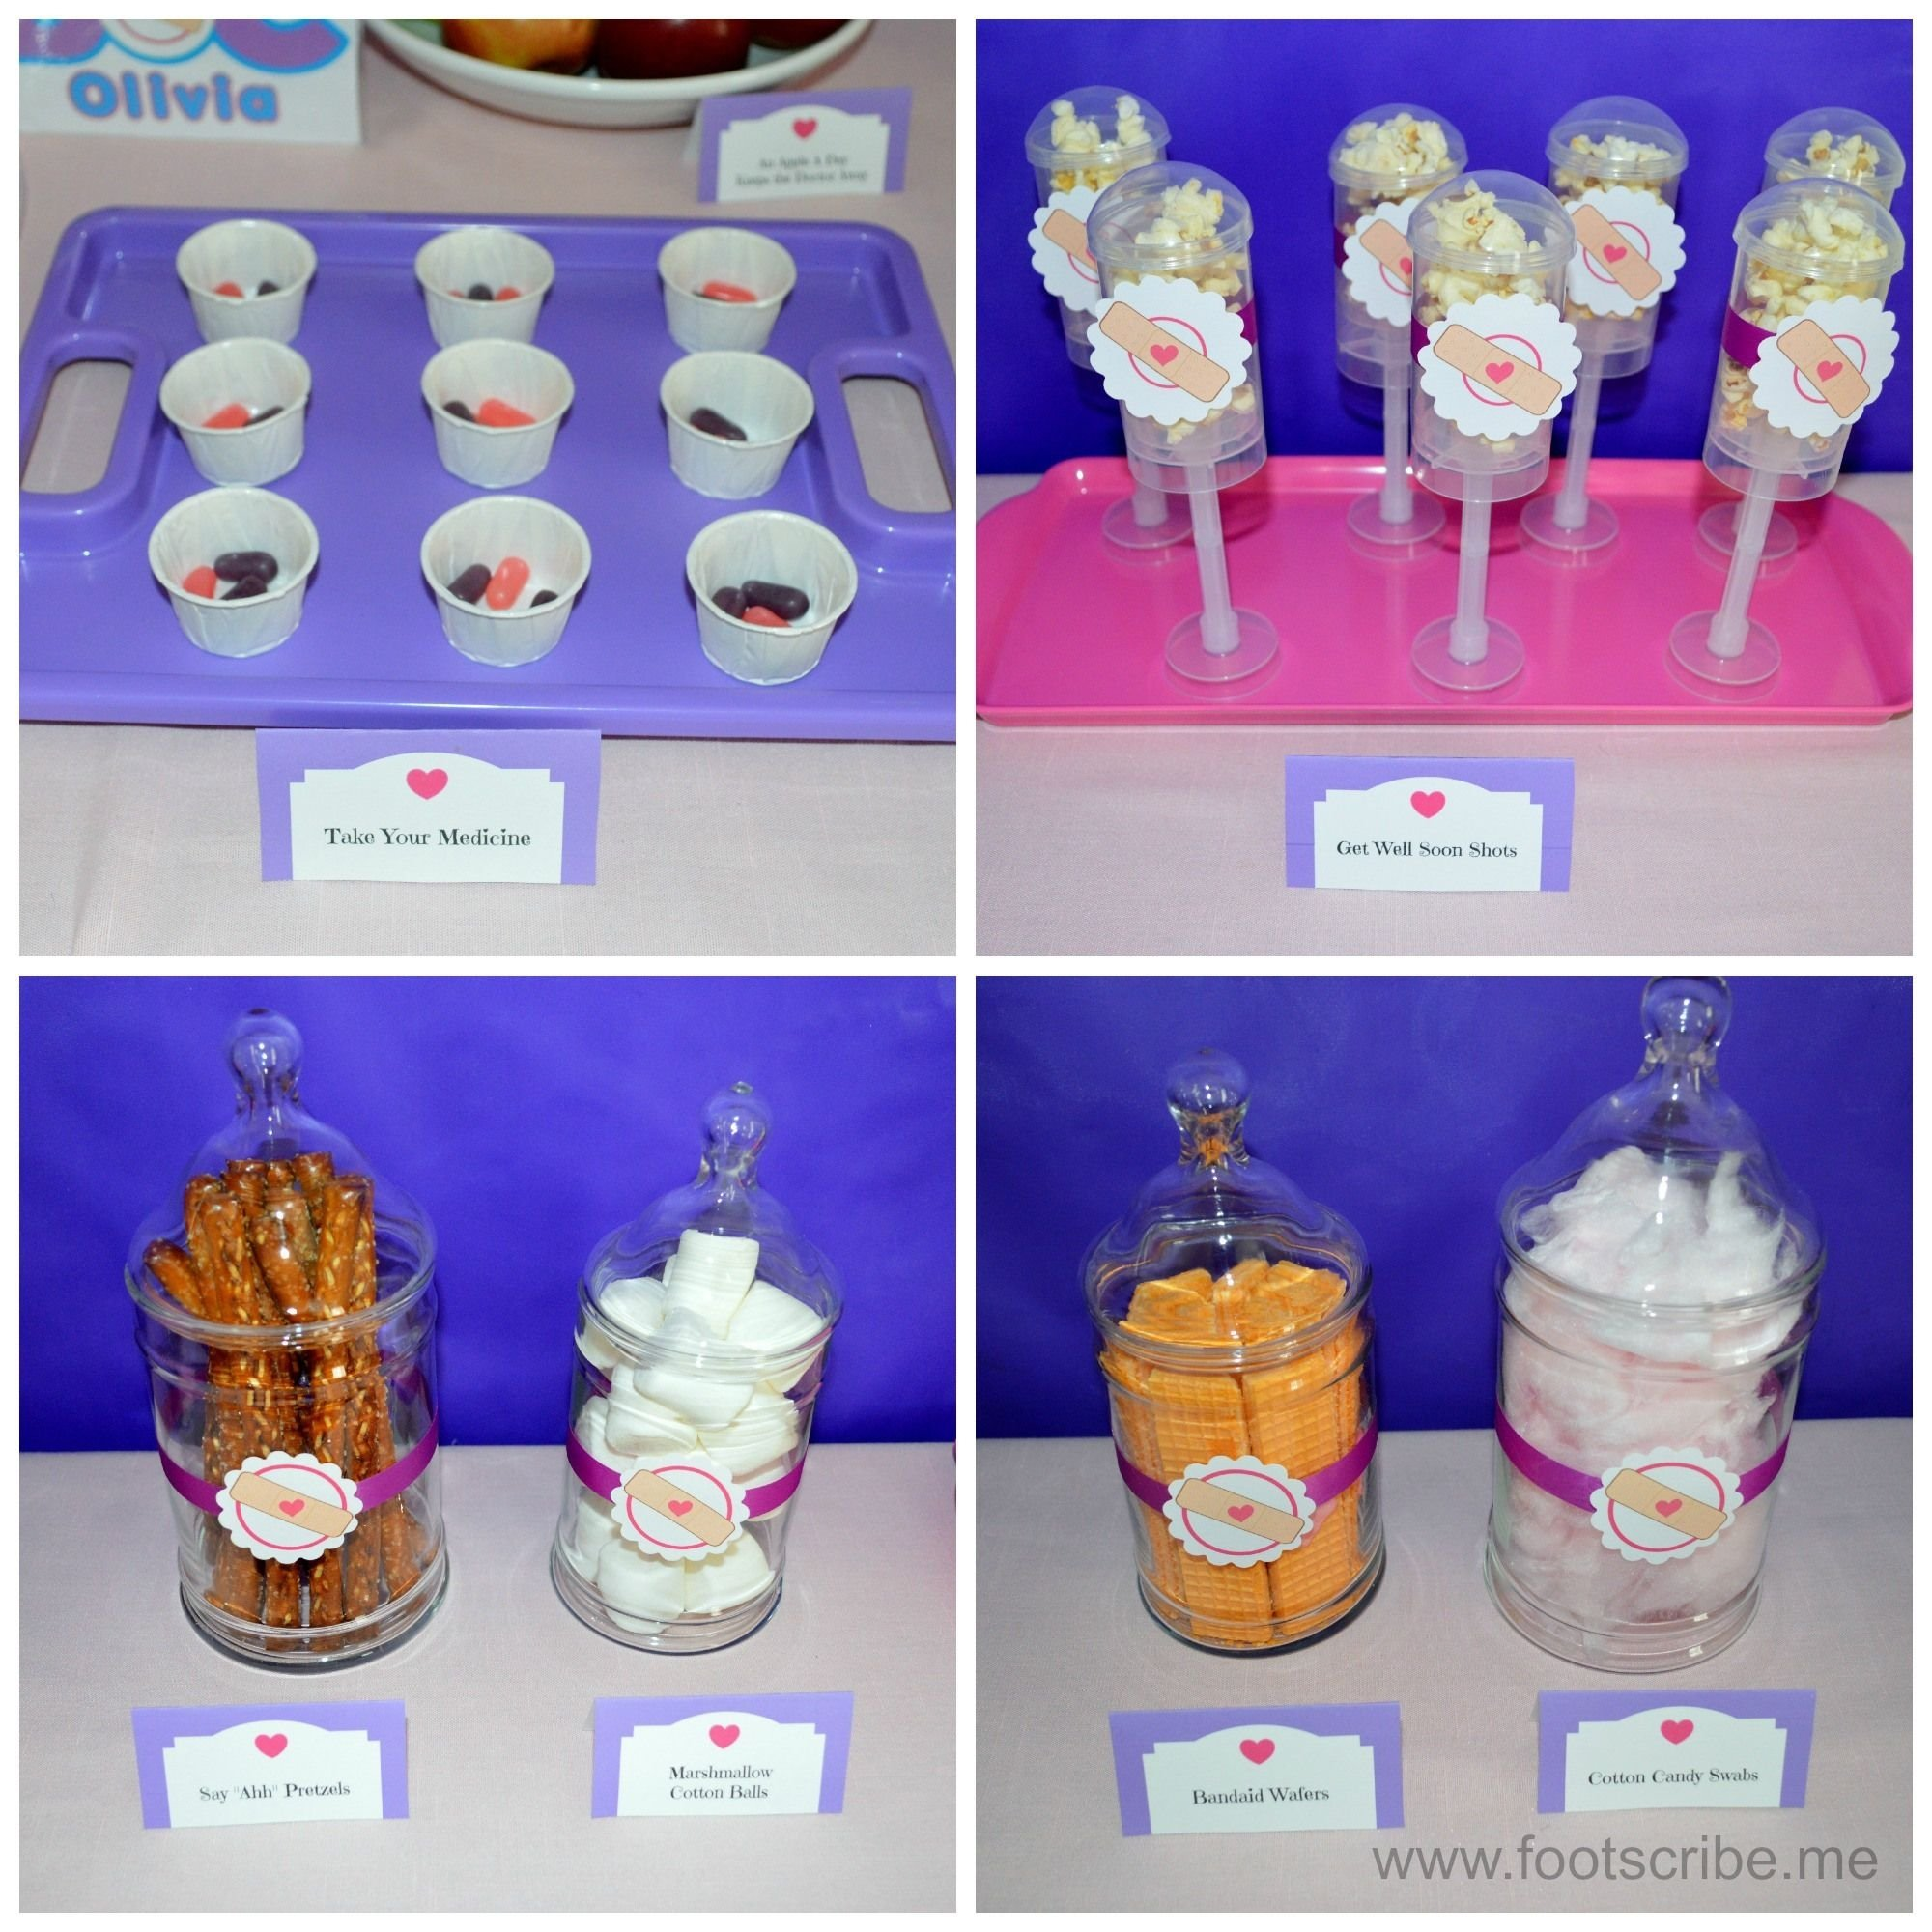 10 Spectacular Doc Mcstuffin Birthday Party Ideas doc mcstuffins birthday party food treats emma edmund